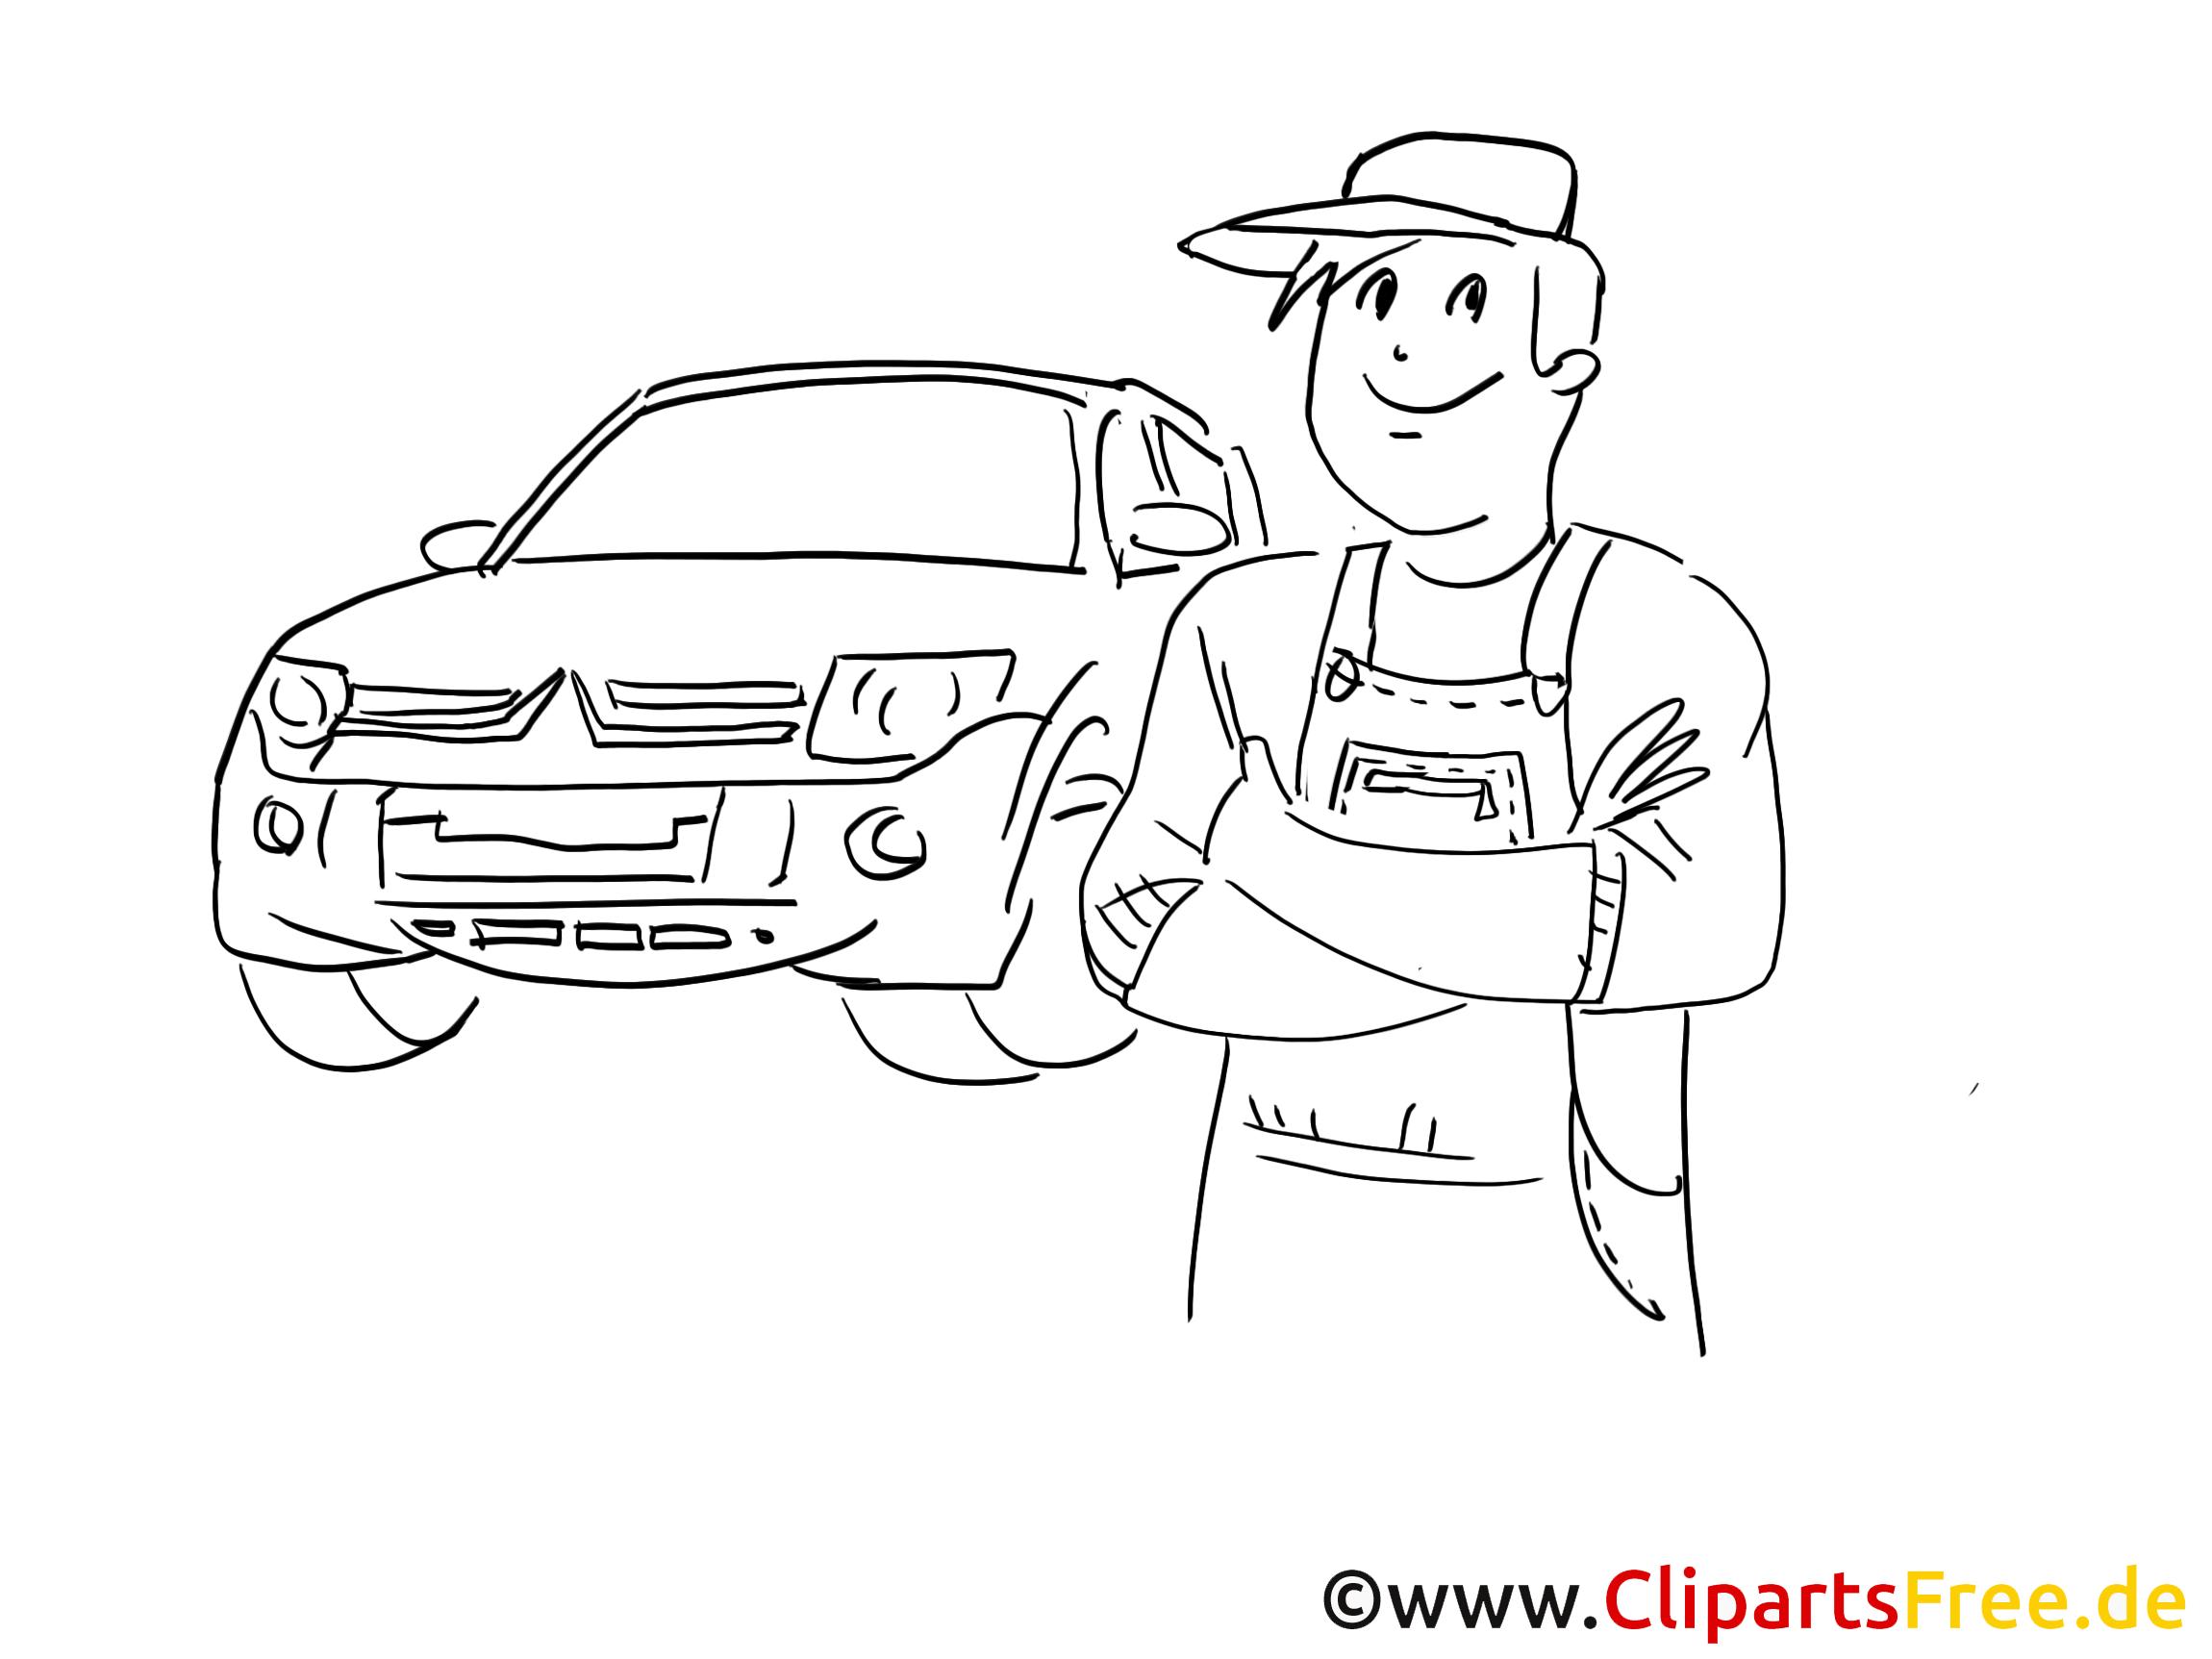 Car maintenance and repair clip art, graphic, pic, cartoon, comic free